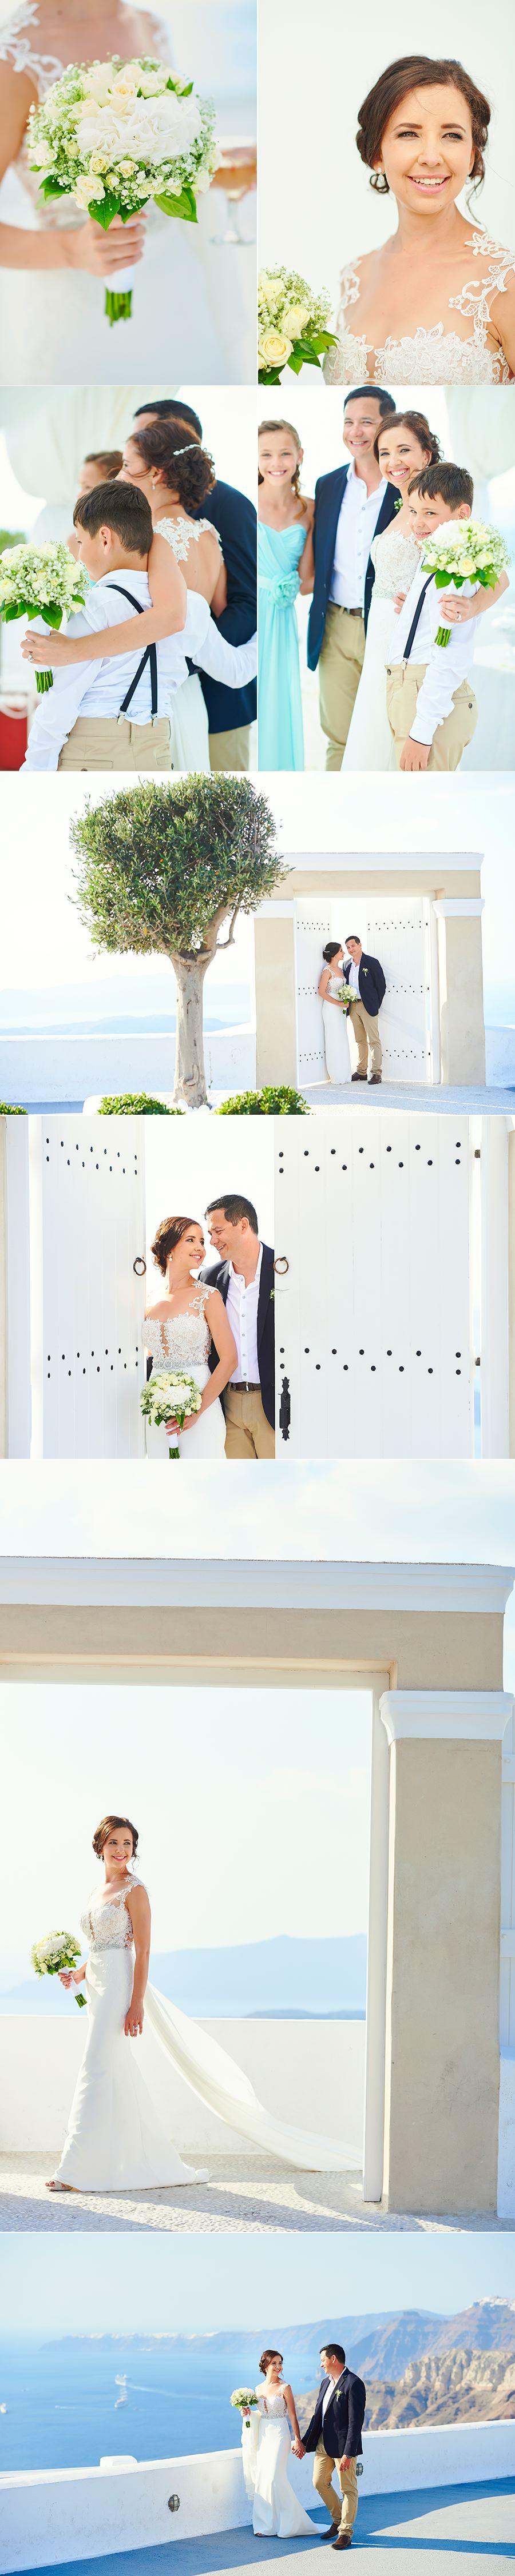 paul-simone-wedding-photos-08